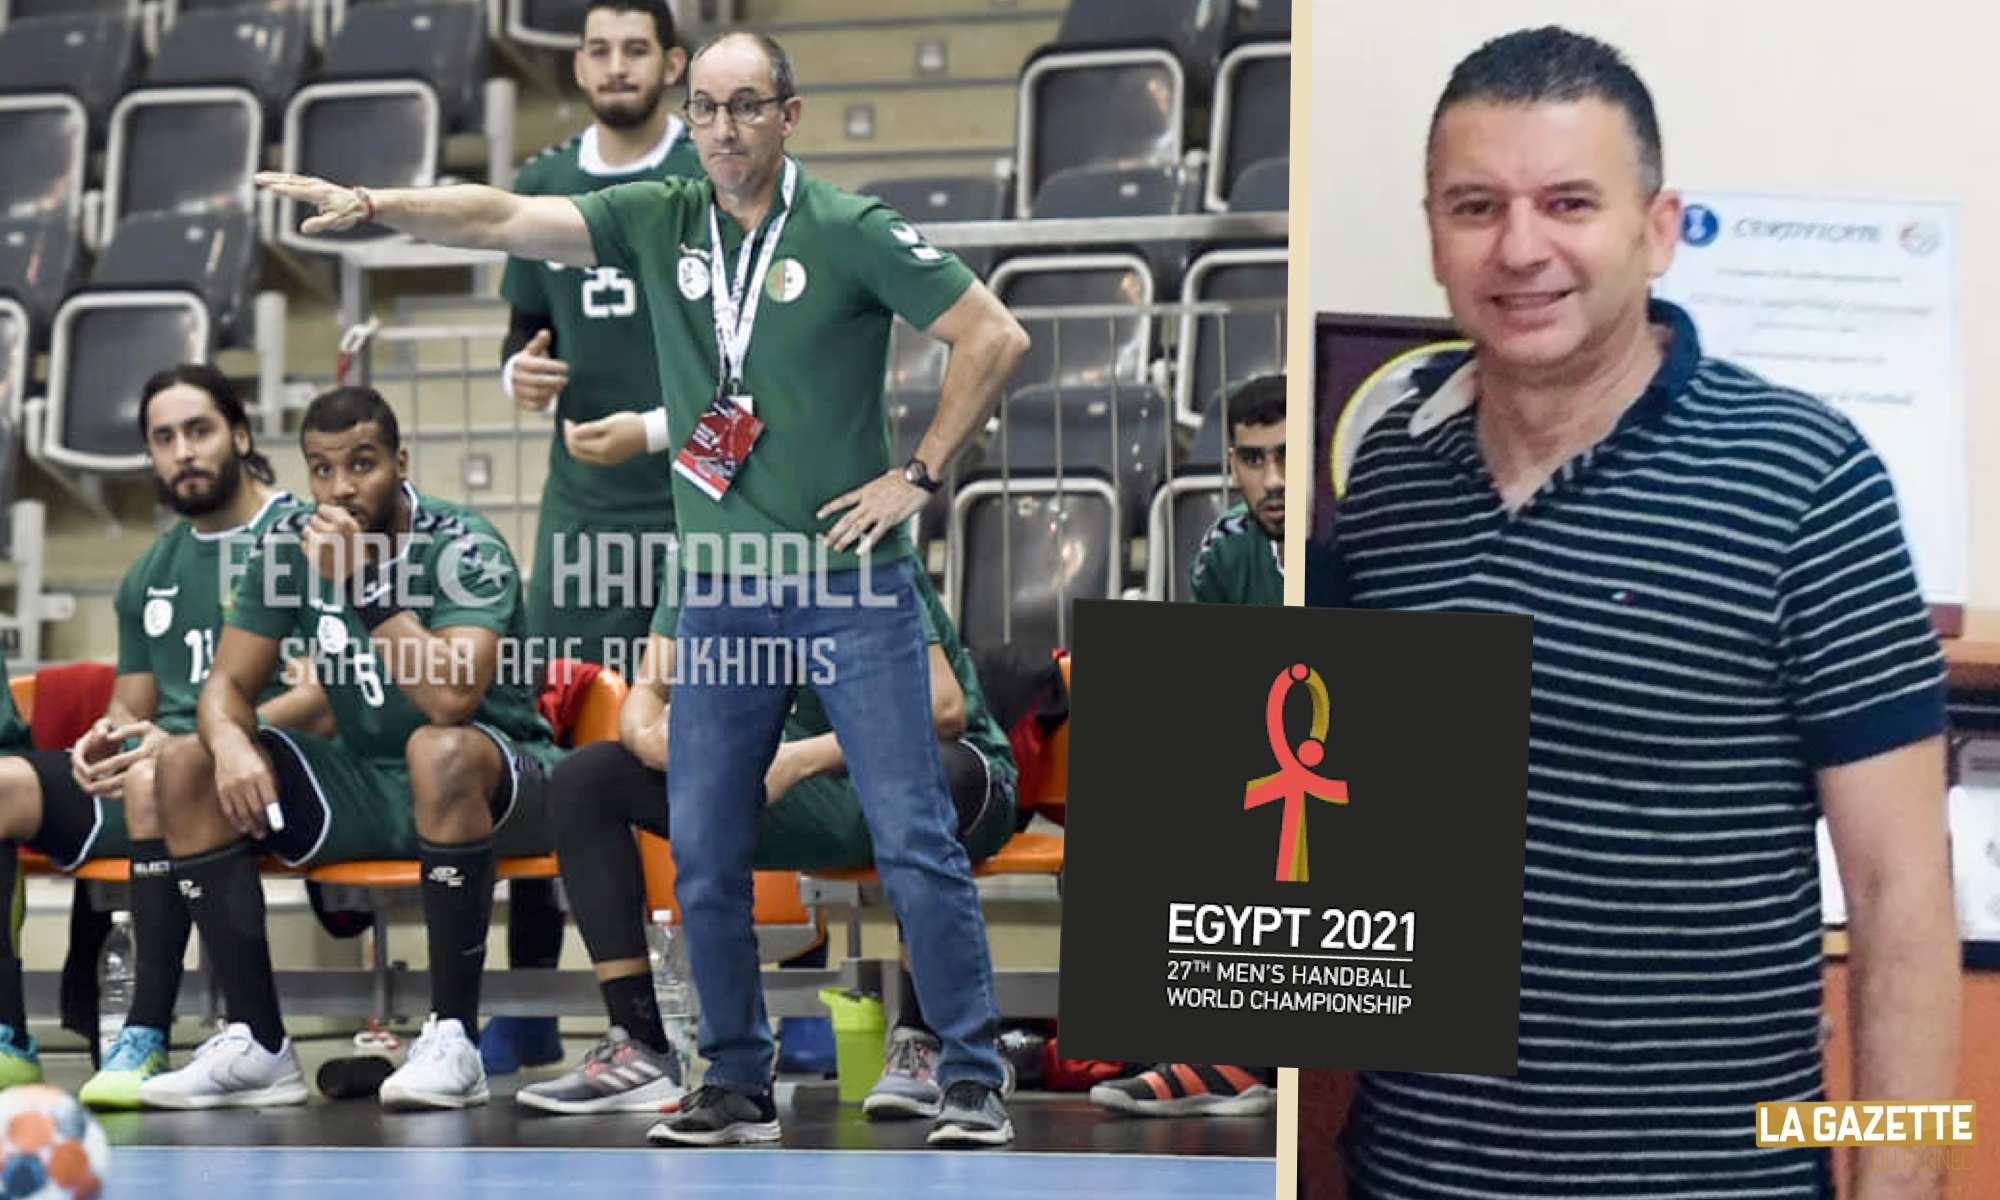 labane handball egypt 2021